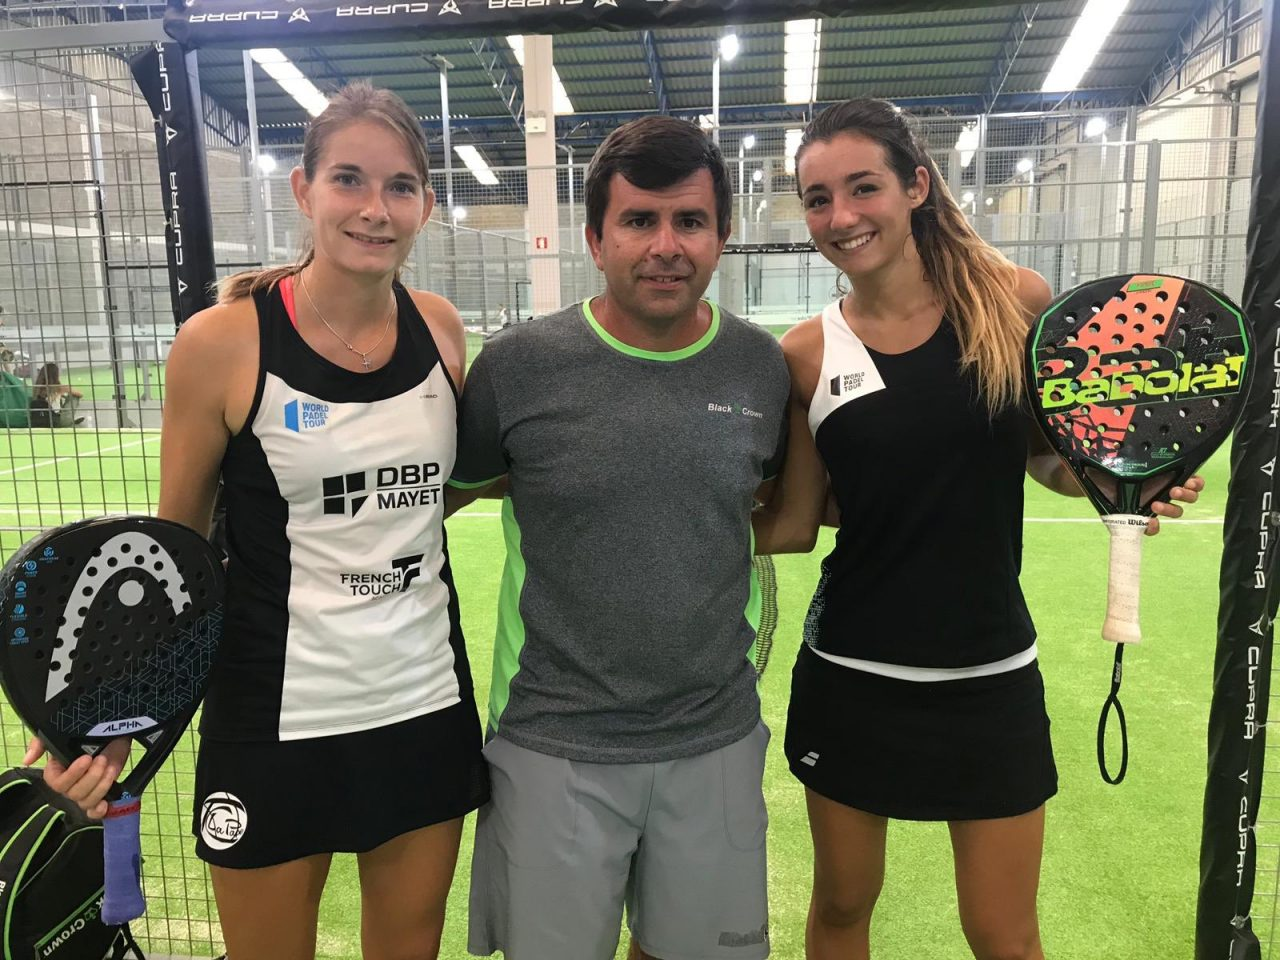 alix-collombon-nicole-traviesa-dieciseisavos-femeninos-cascais-padel-master-2019